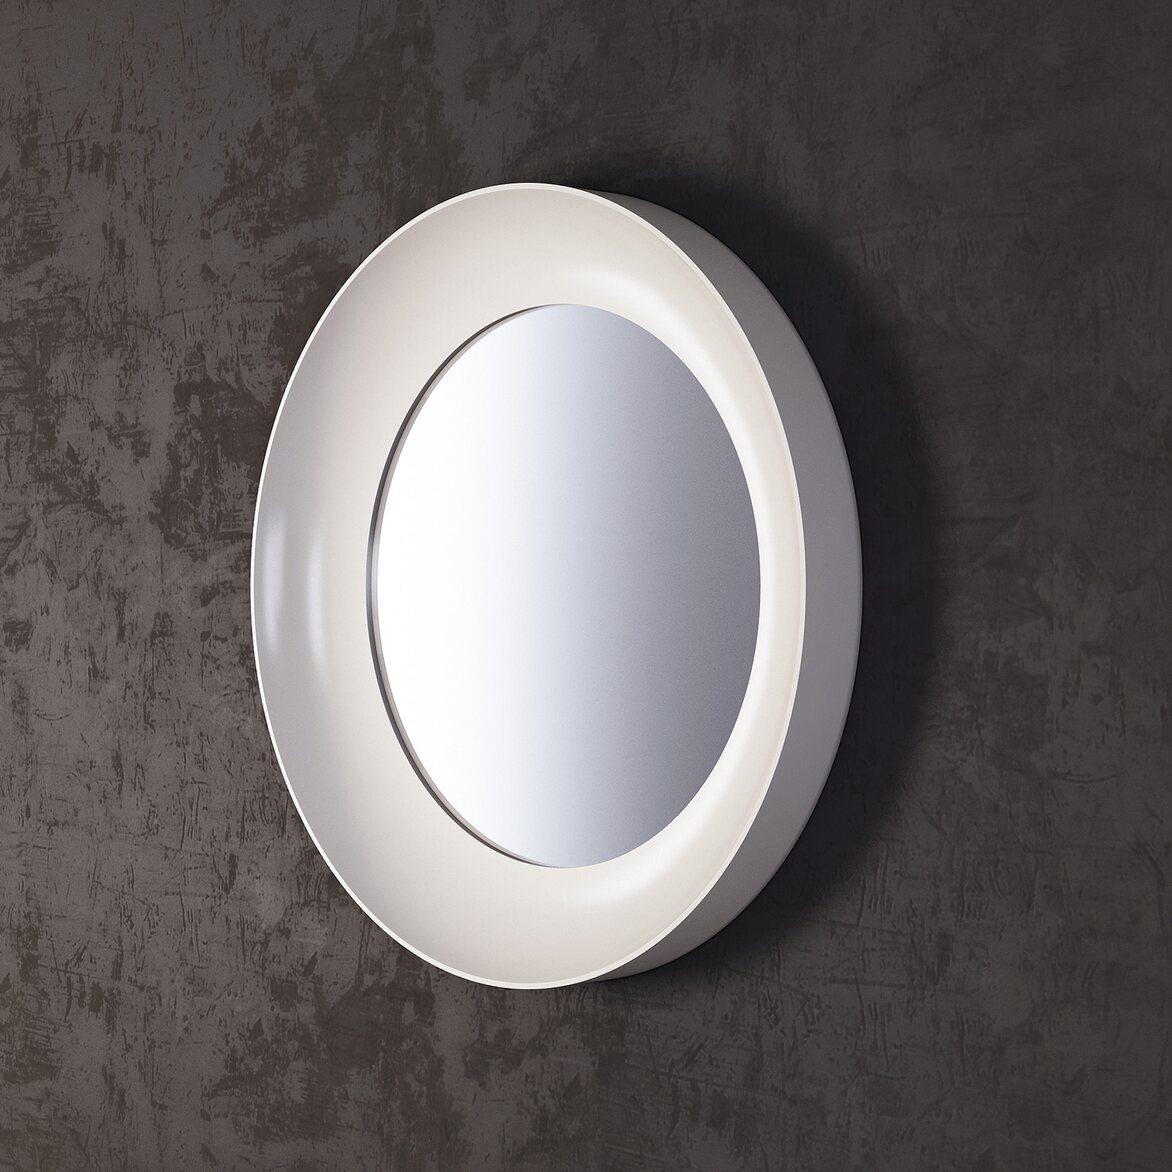 Зеркало Clayton, белое 2 | Настенные зеркала Kingsby